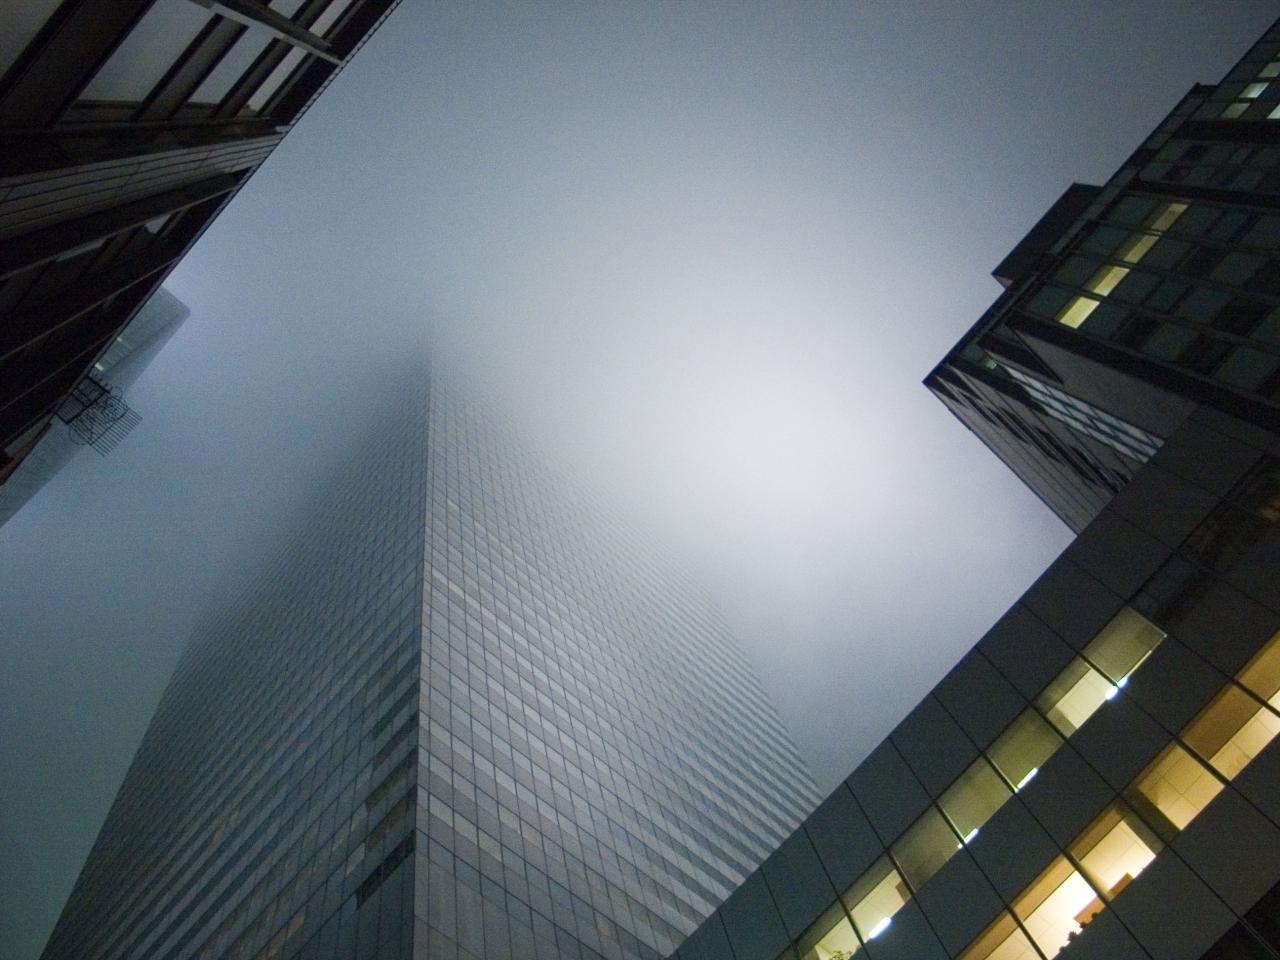 Fog, 2008, digital photograph by Orin Buck.